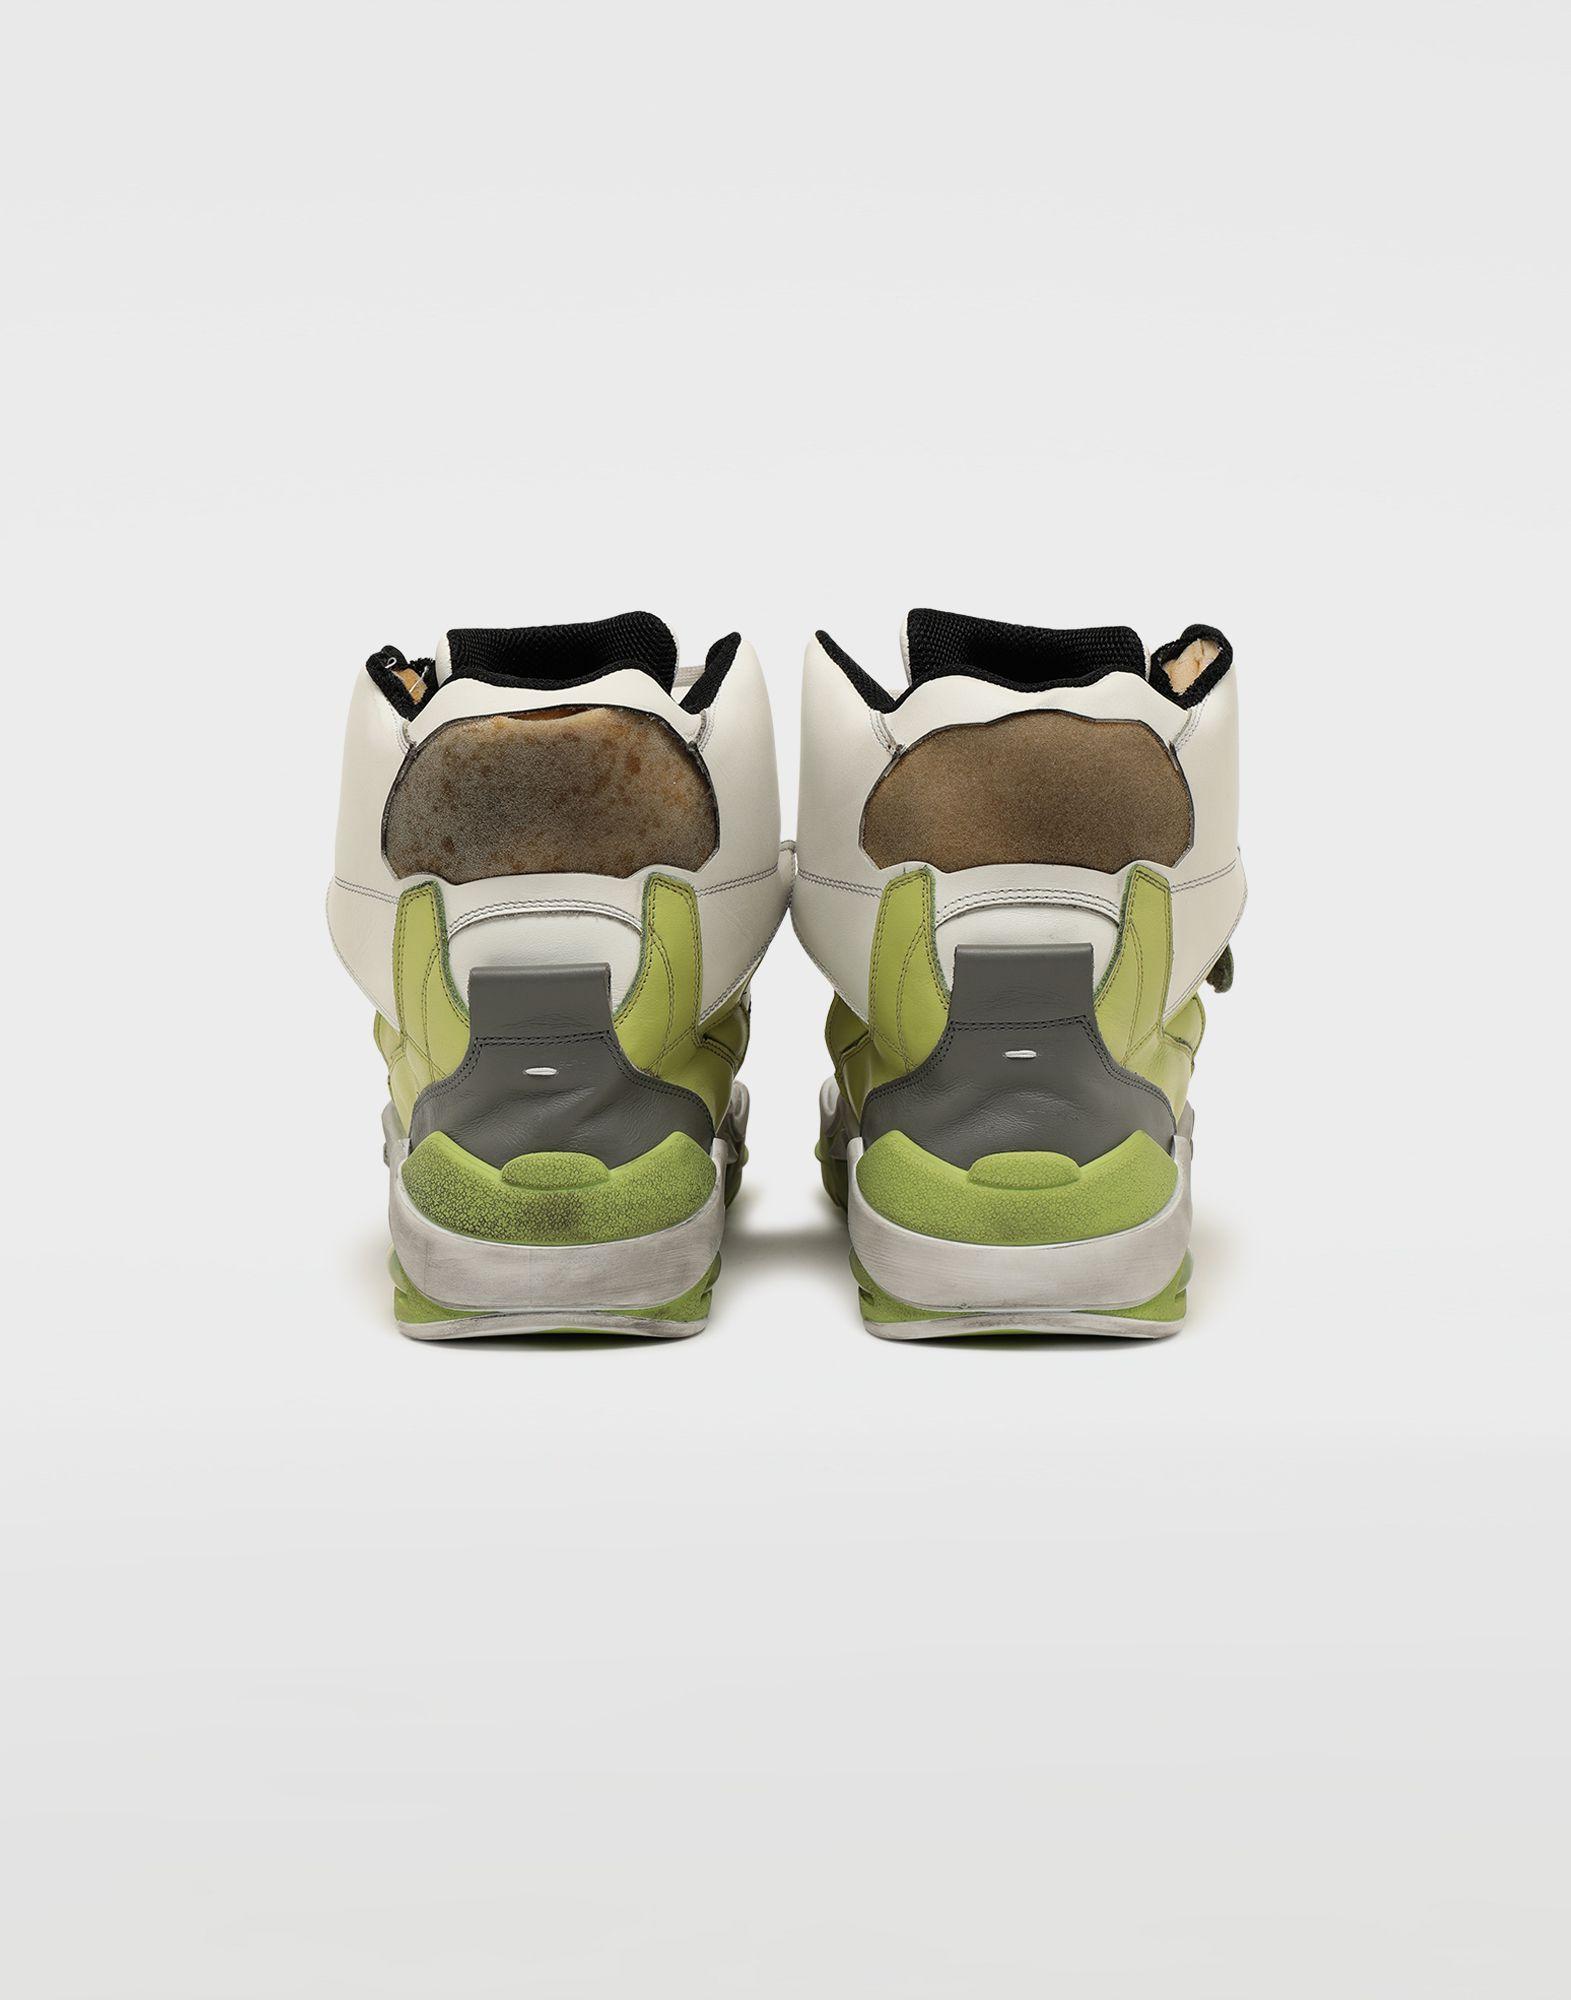 MAISON MARGIELA High-Top-Sneakers Retro Fit Sneakers Herr d